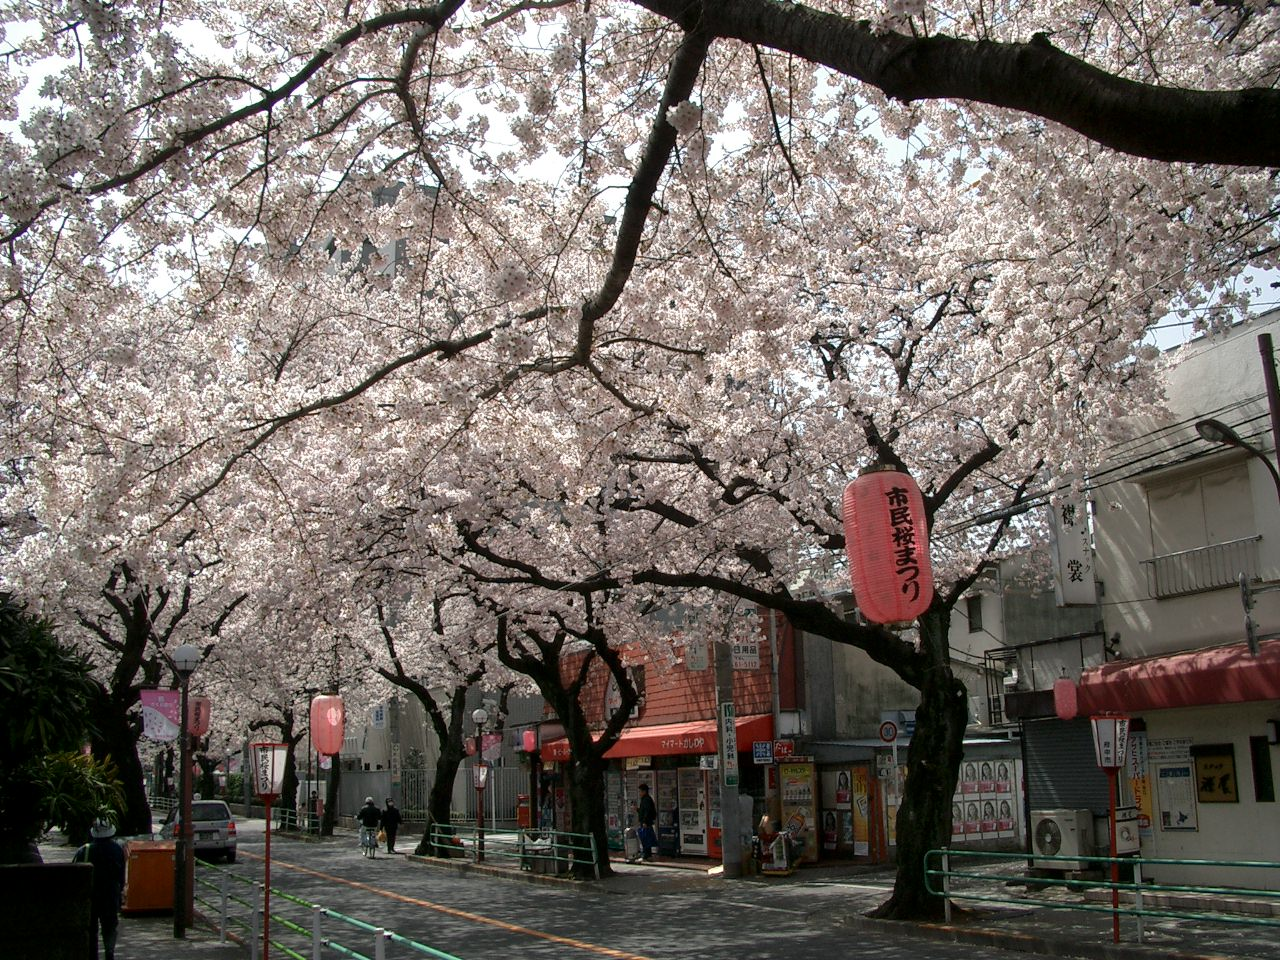 Fuchu-Koen-Dori_in_Fuchu_Tokyo_Japan